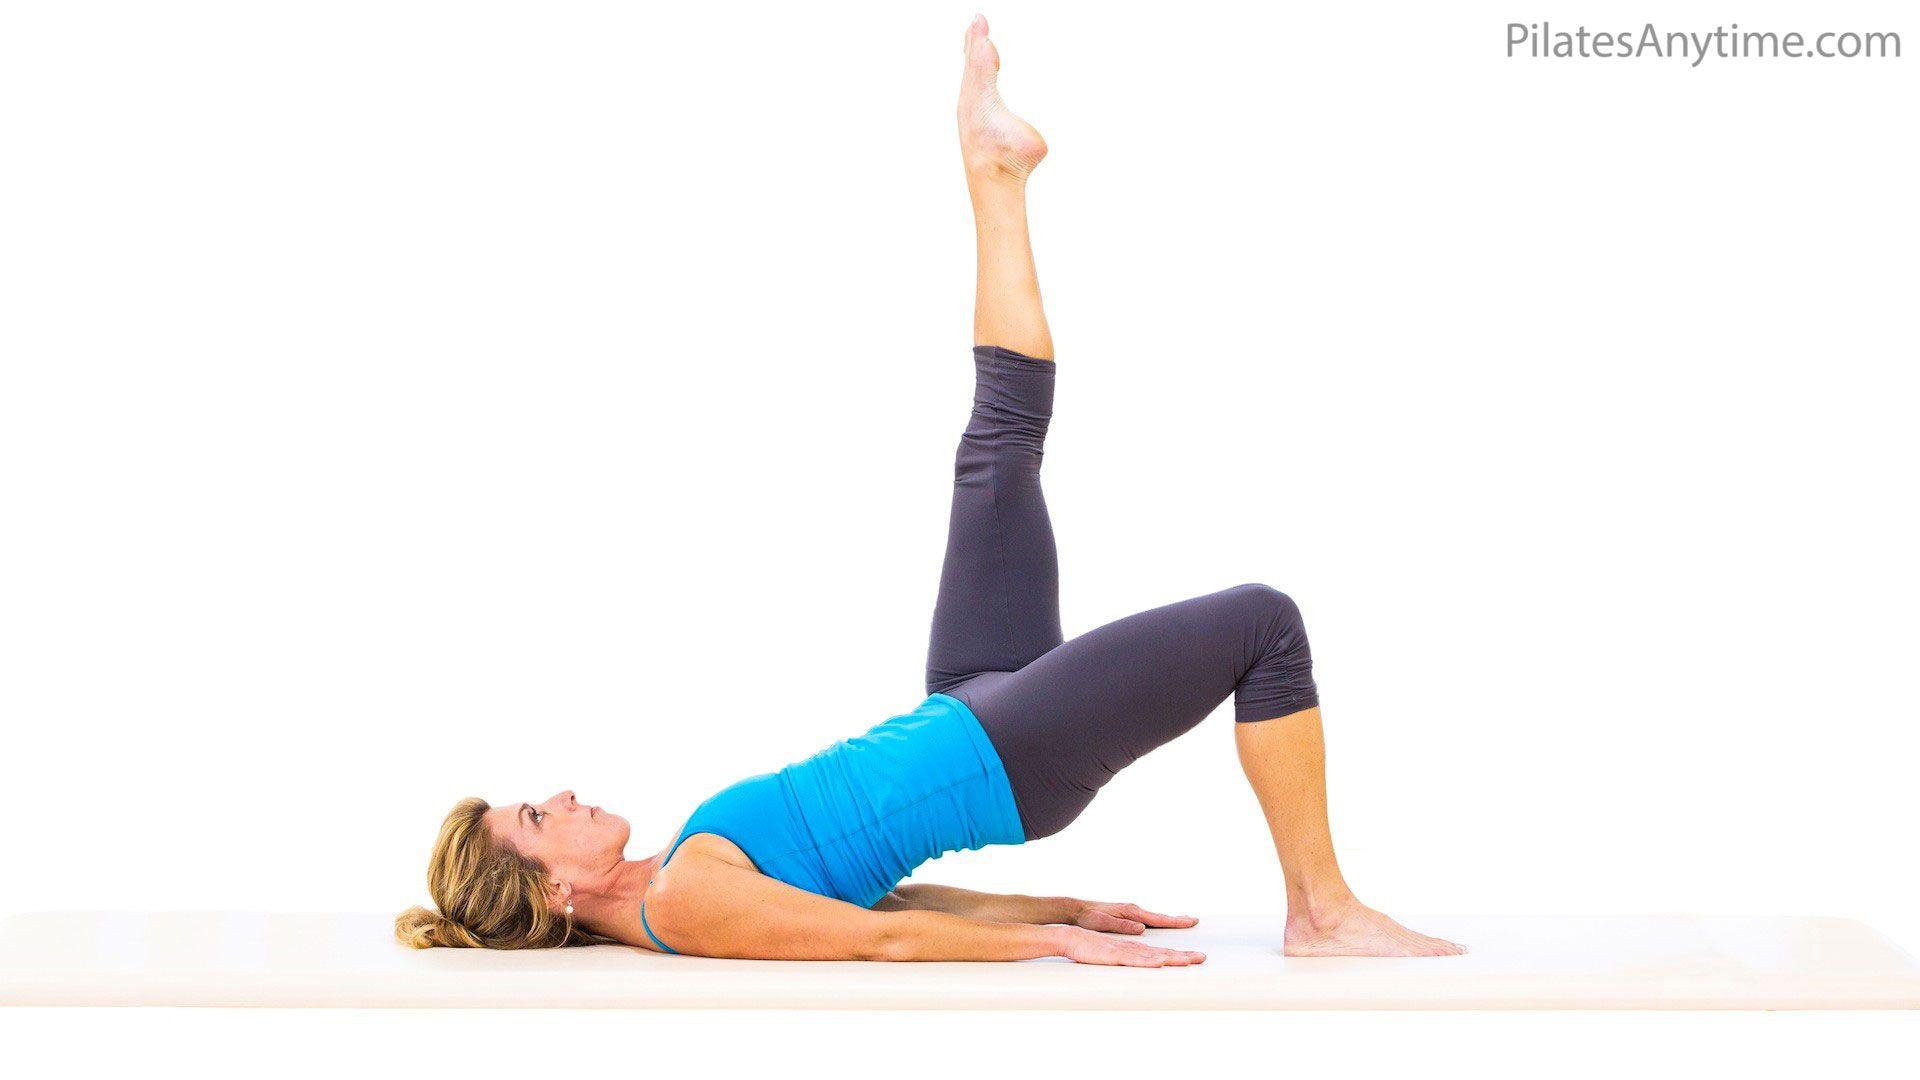 Shoulder Bridge | Pilates videos, Pilates programs, Exercise